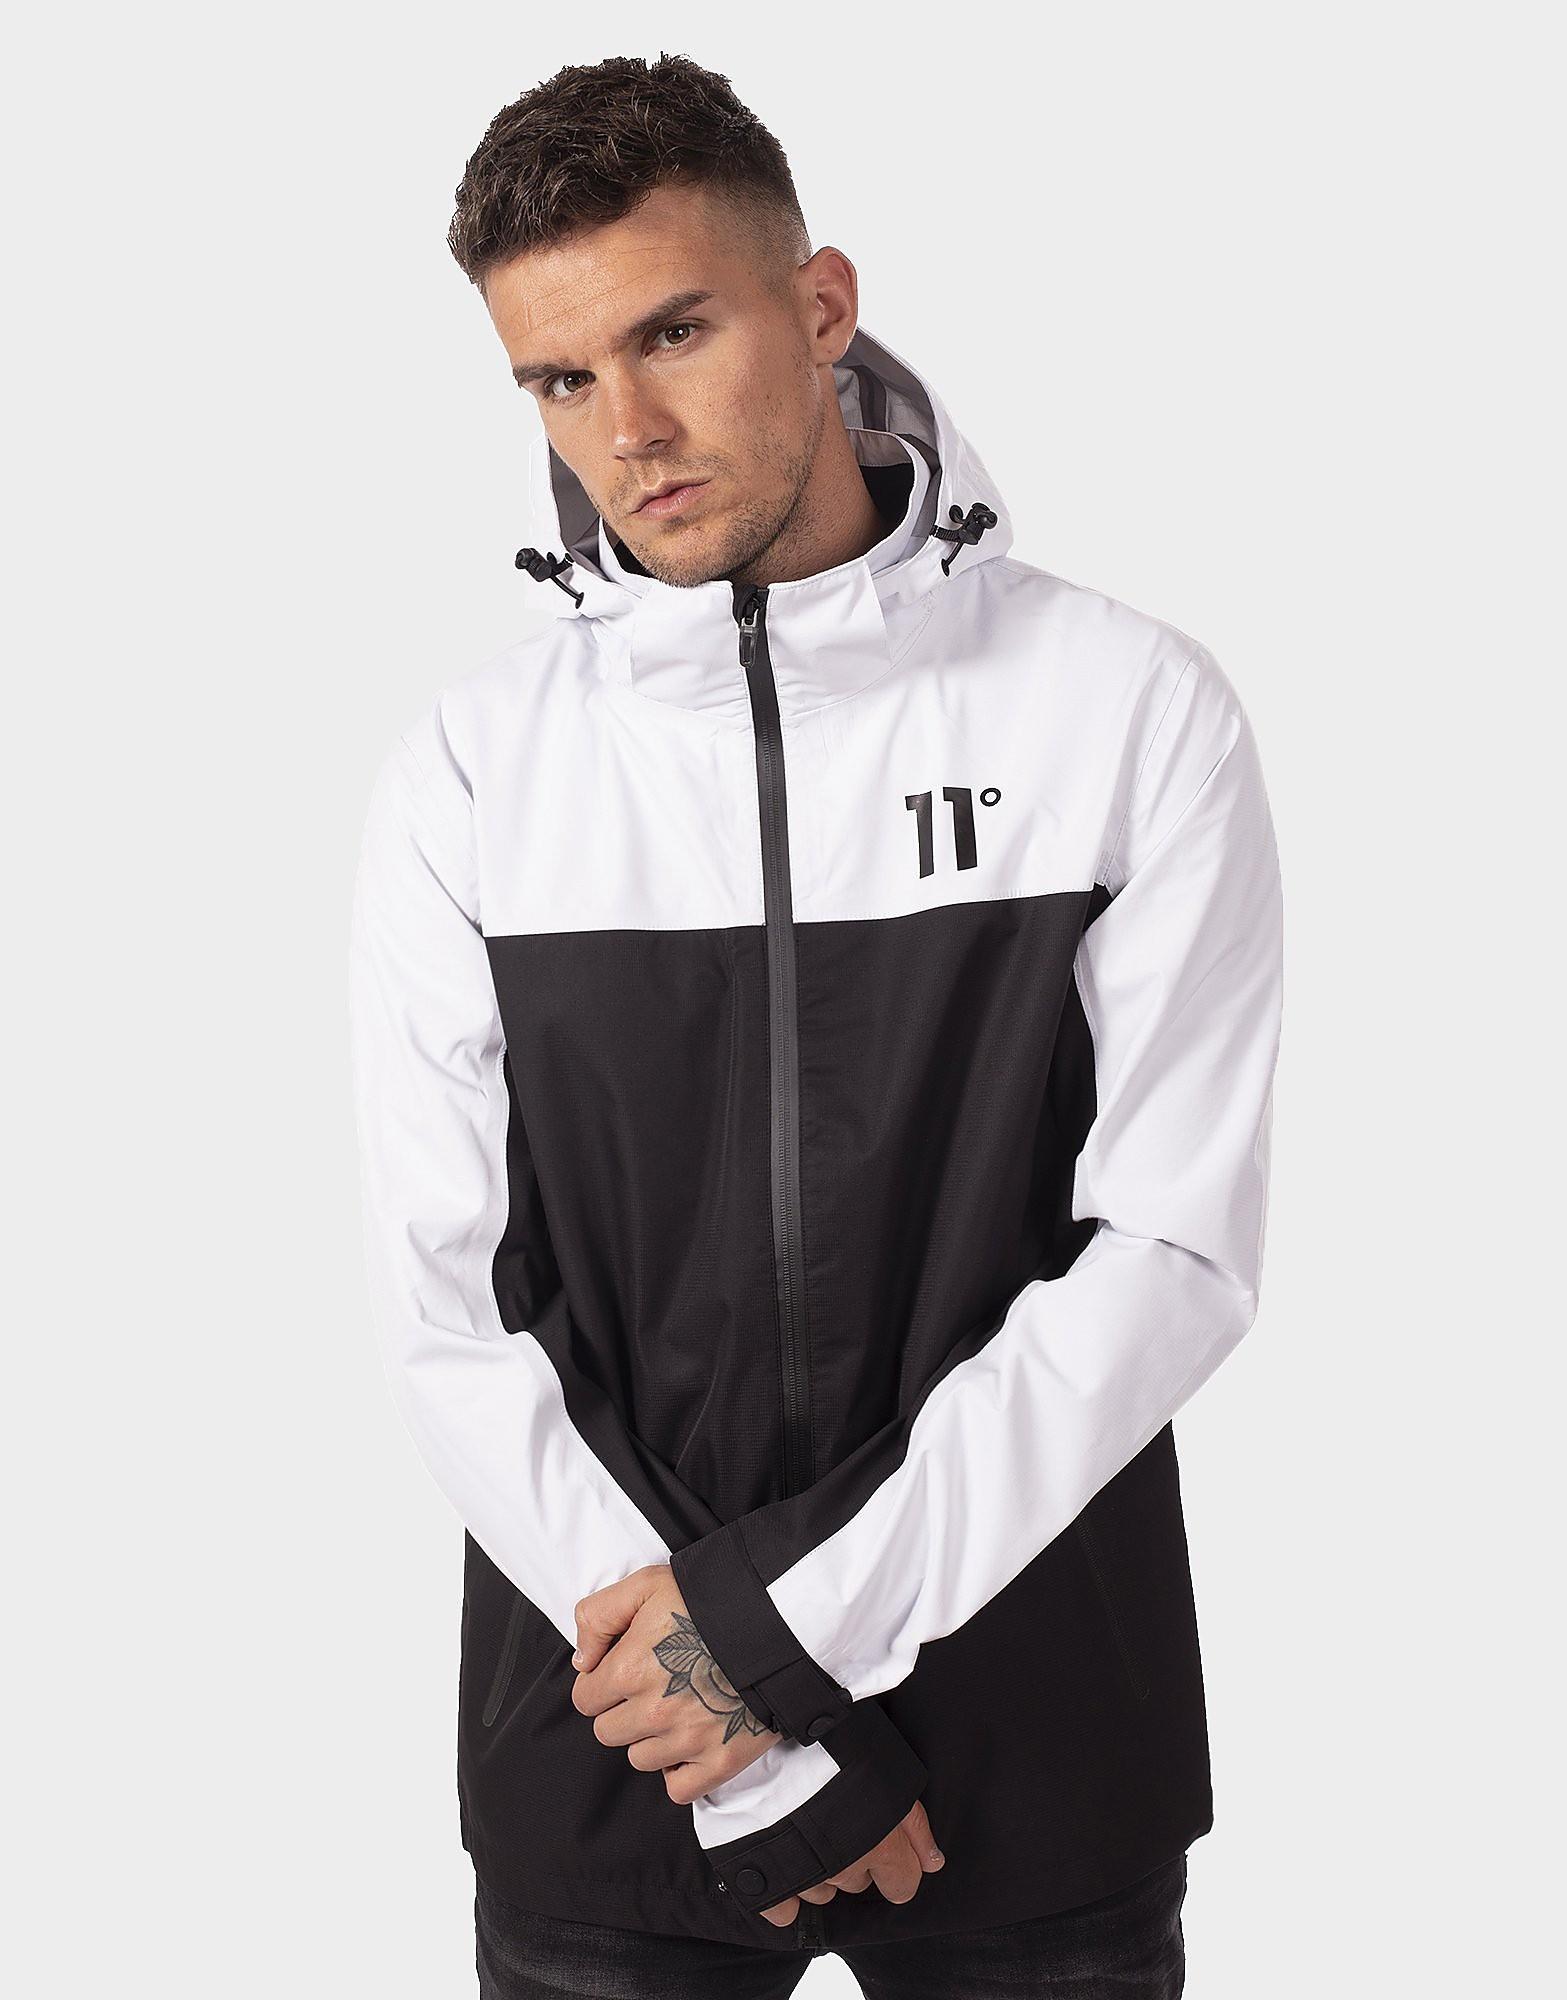 11 Degrees Colour Block Jacket - Weiss - Mens, Weiss